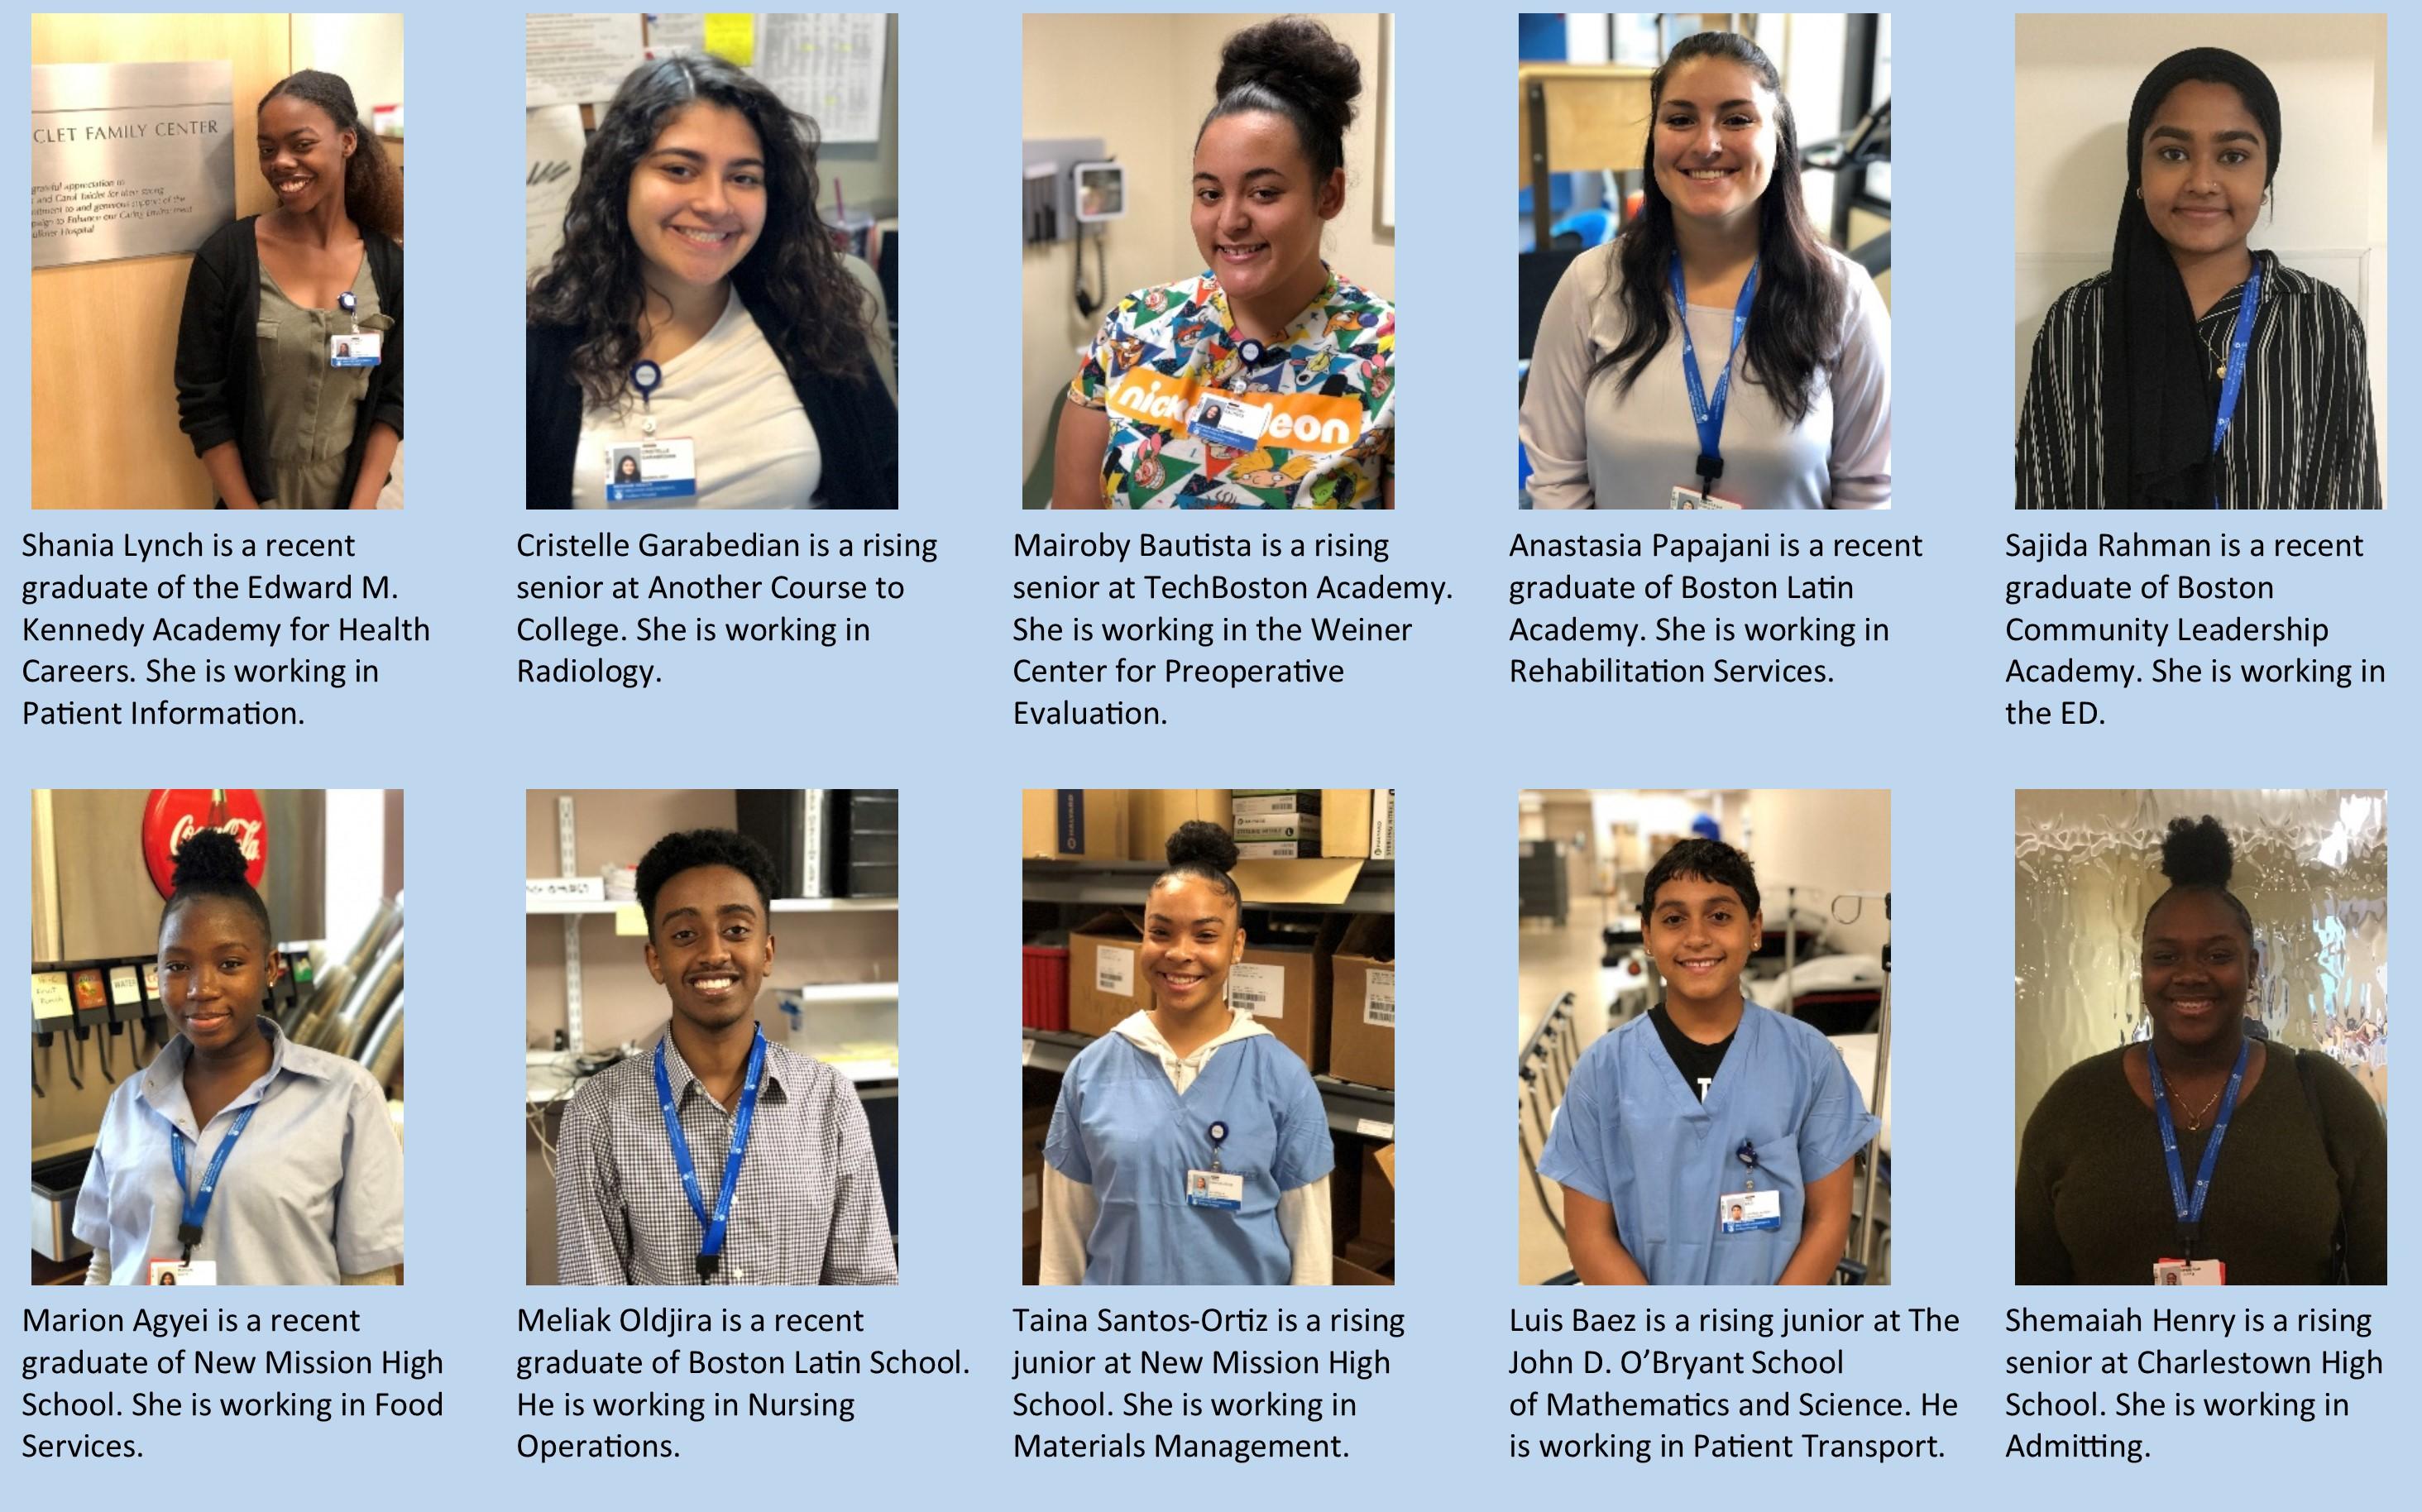 summer jobs program introduces local high school students